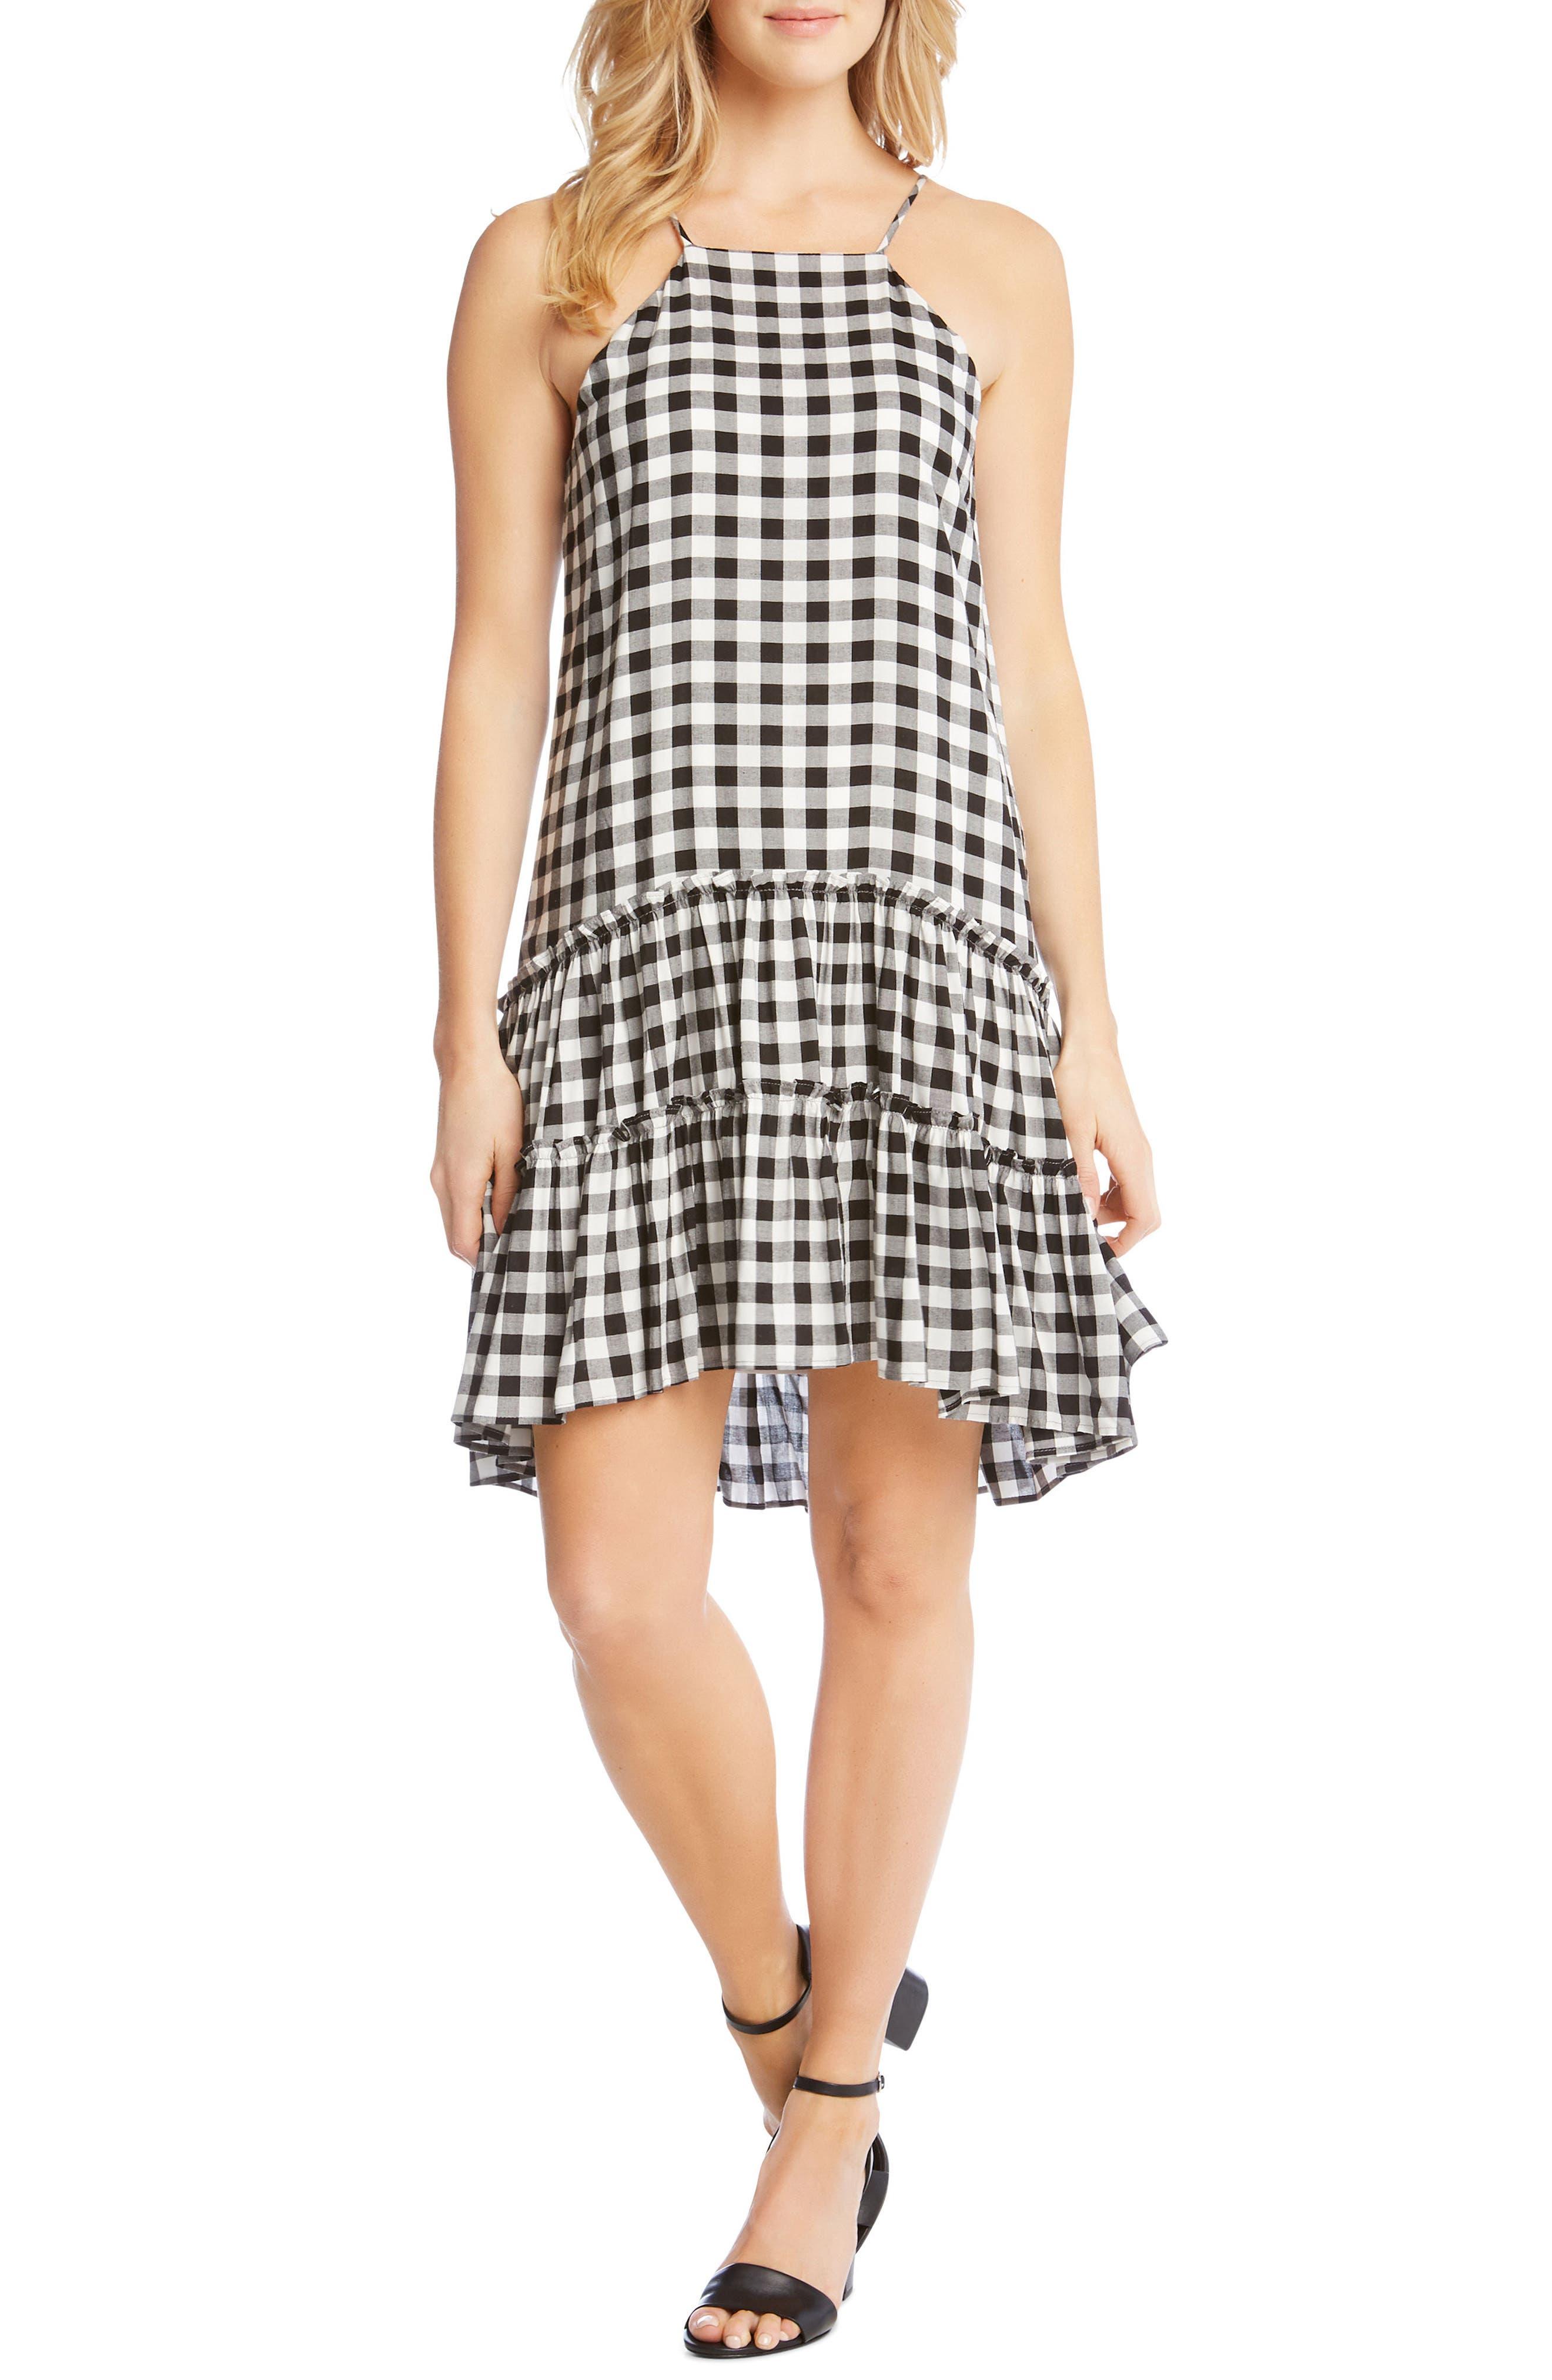 Gingham Ruffle Hem Halter Top Dress,                             Main thumbnail 1, color,                             Check